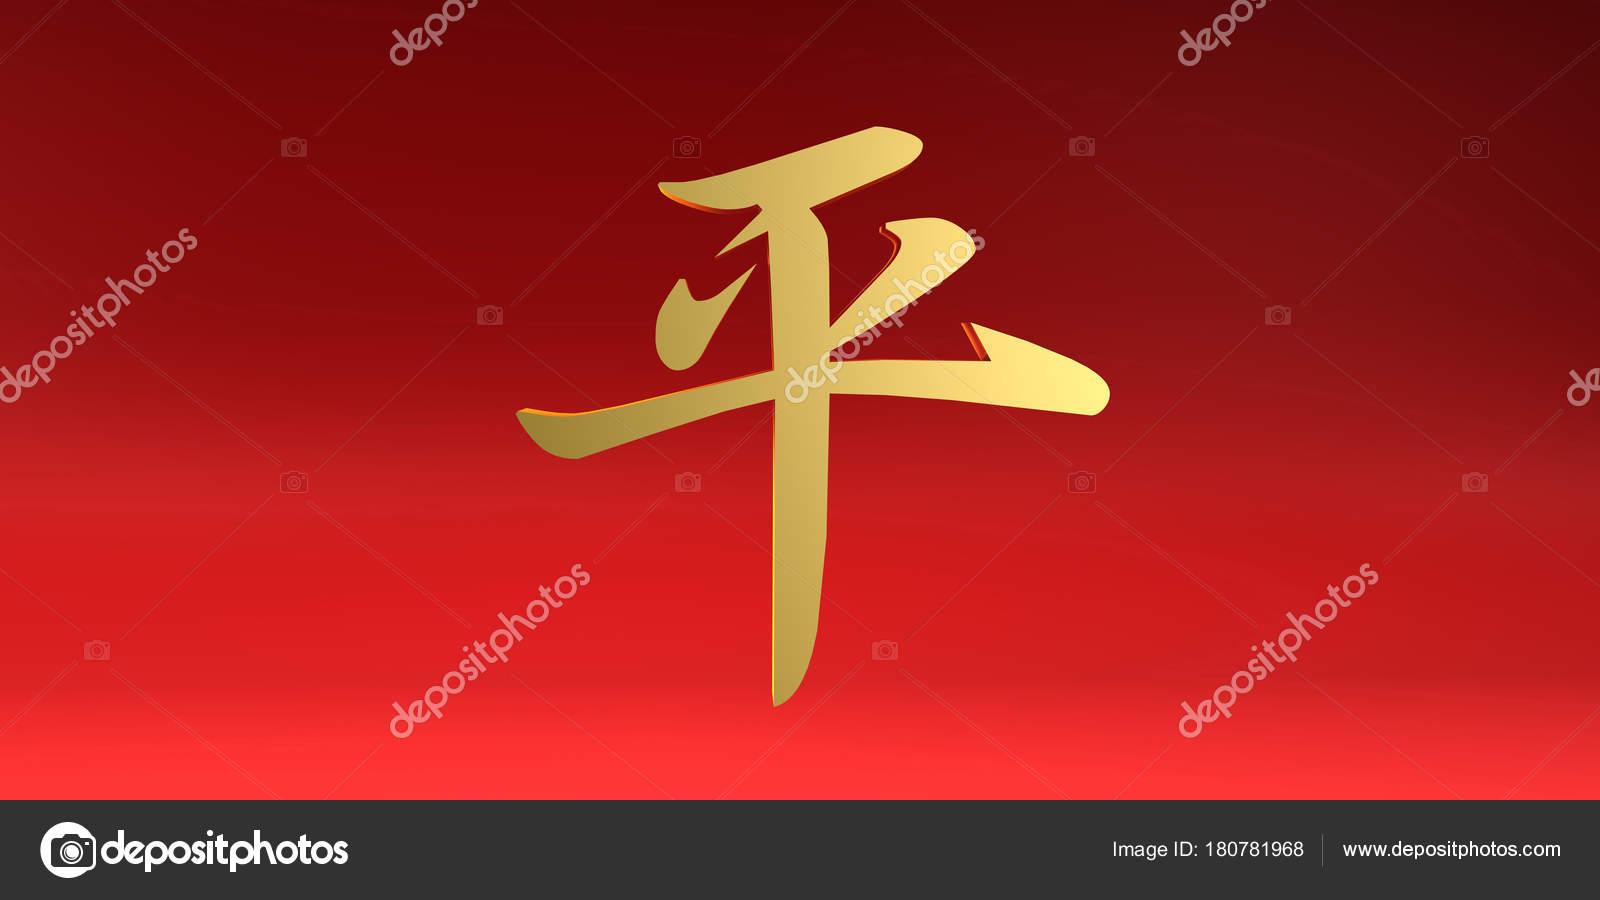 Peace Chinese Calligraphy Symbol Stock Photo Kentoh 180781968